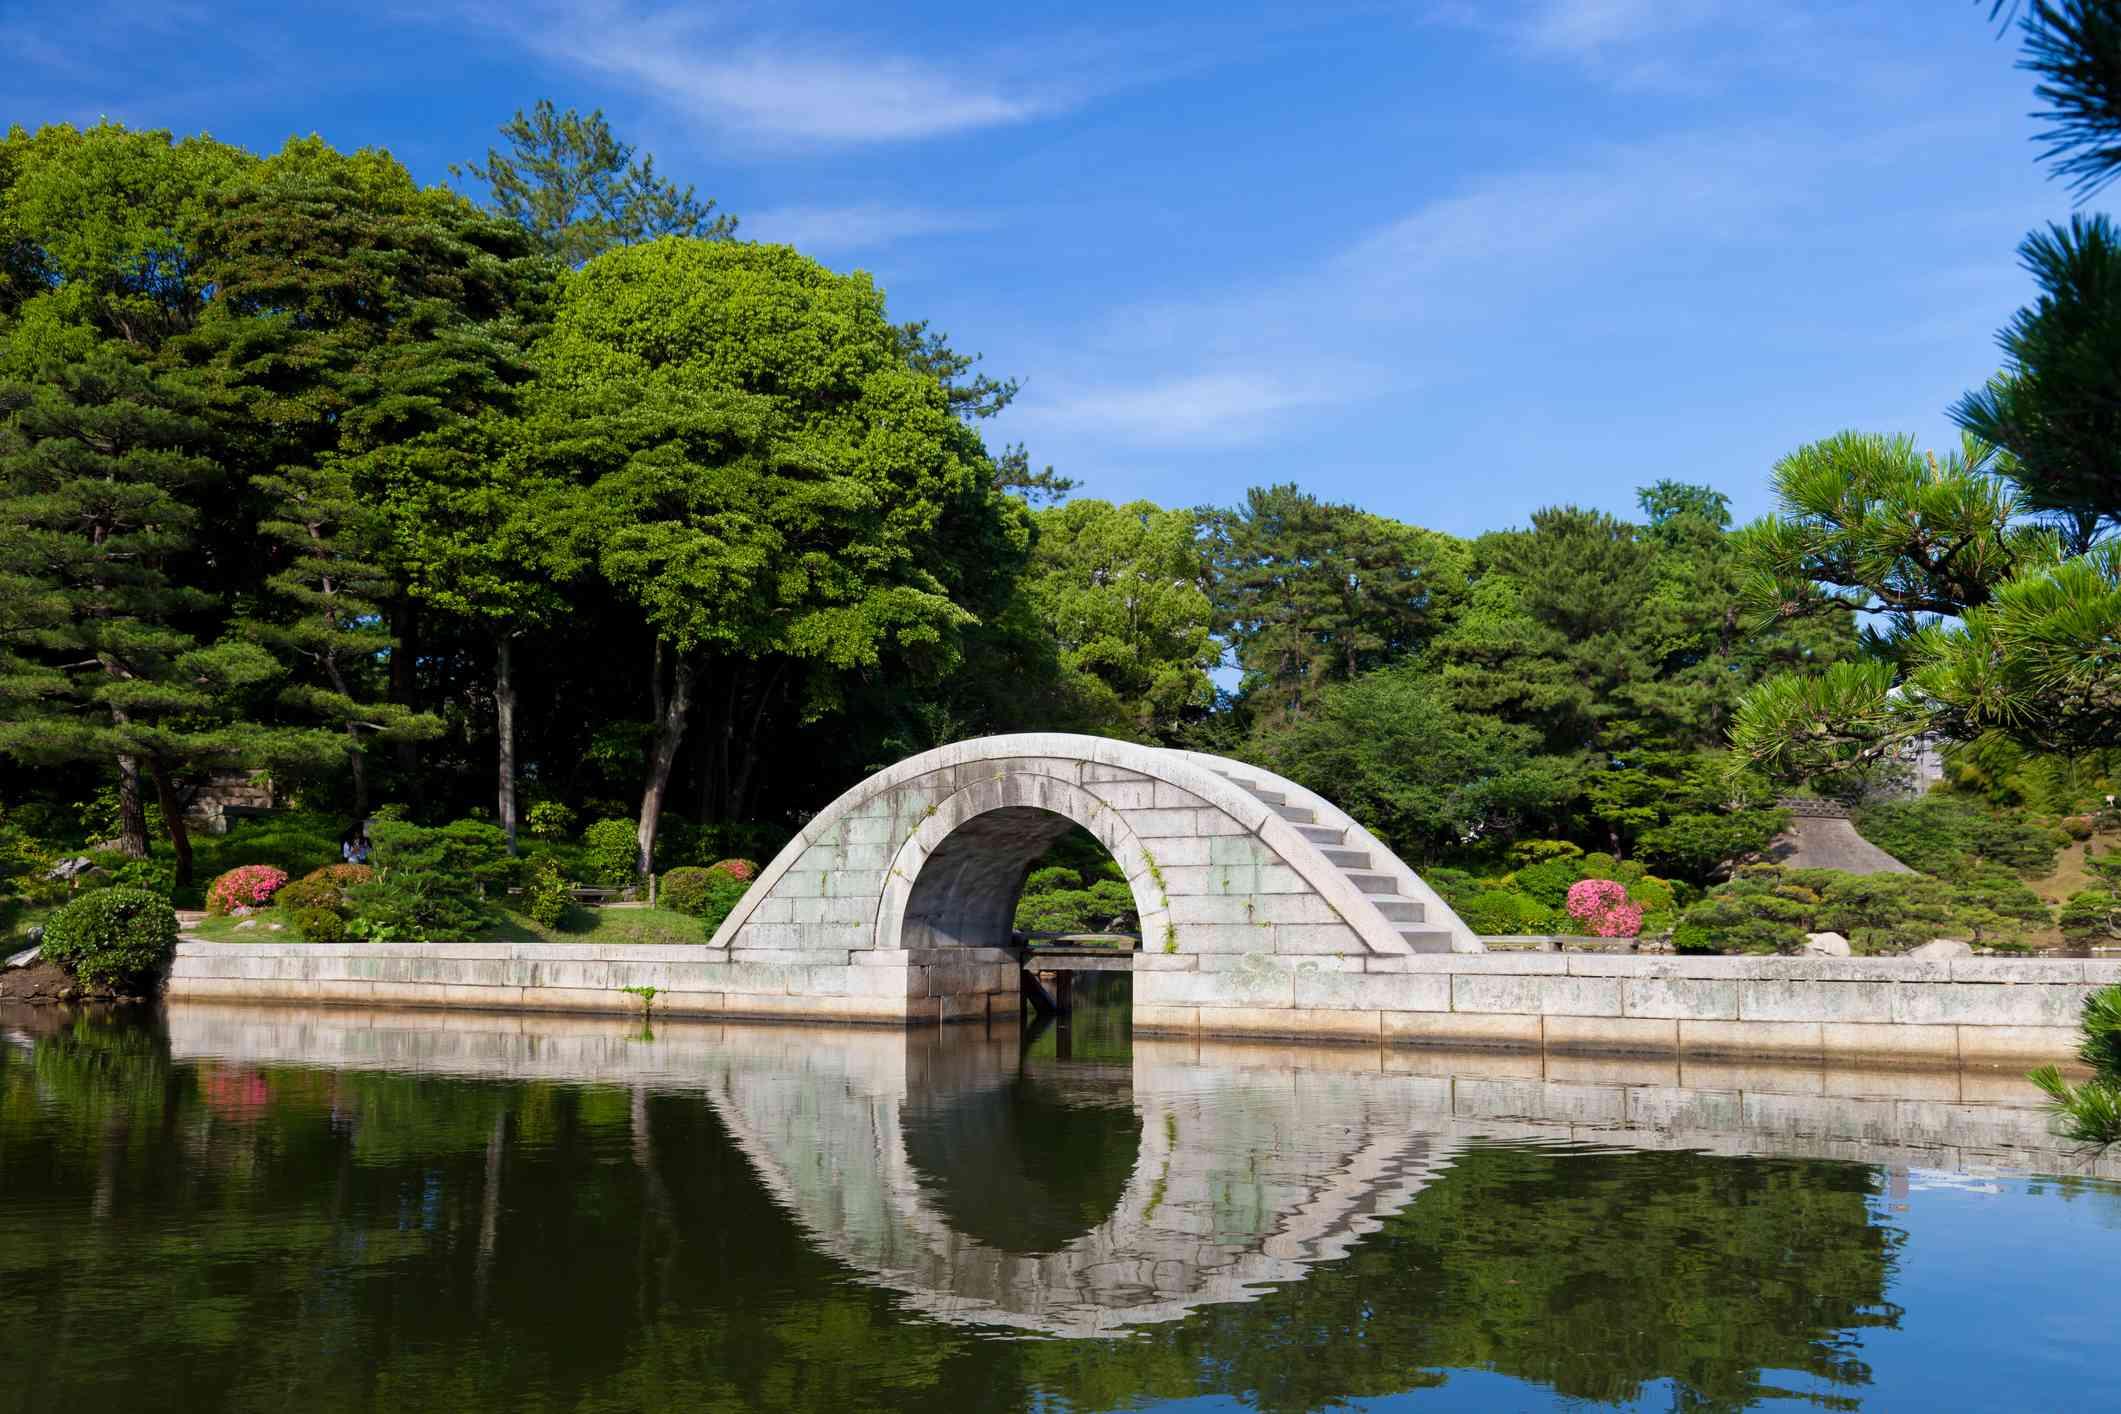 small stone bridge over a pond in a Garden in Hiroshima